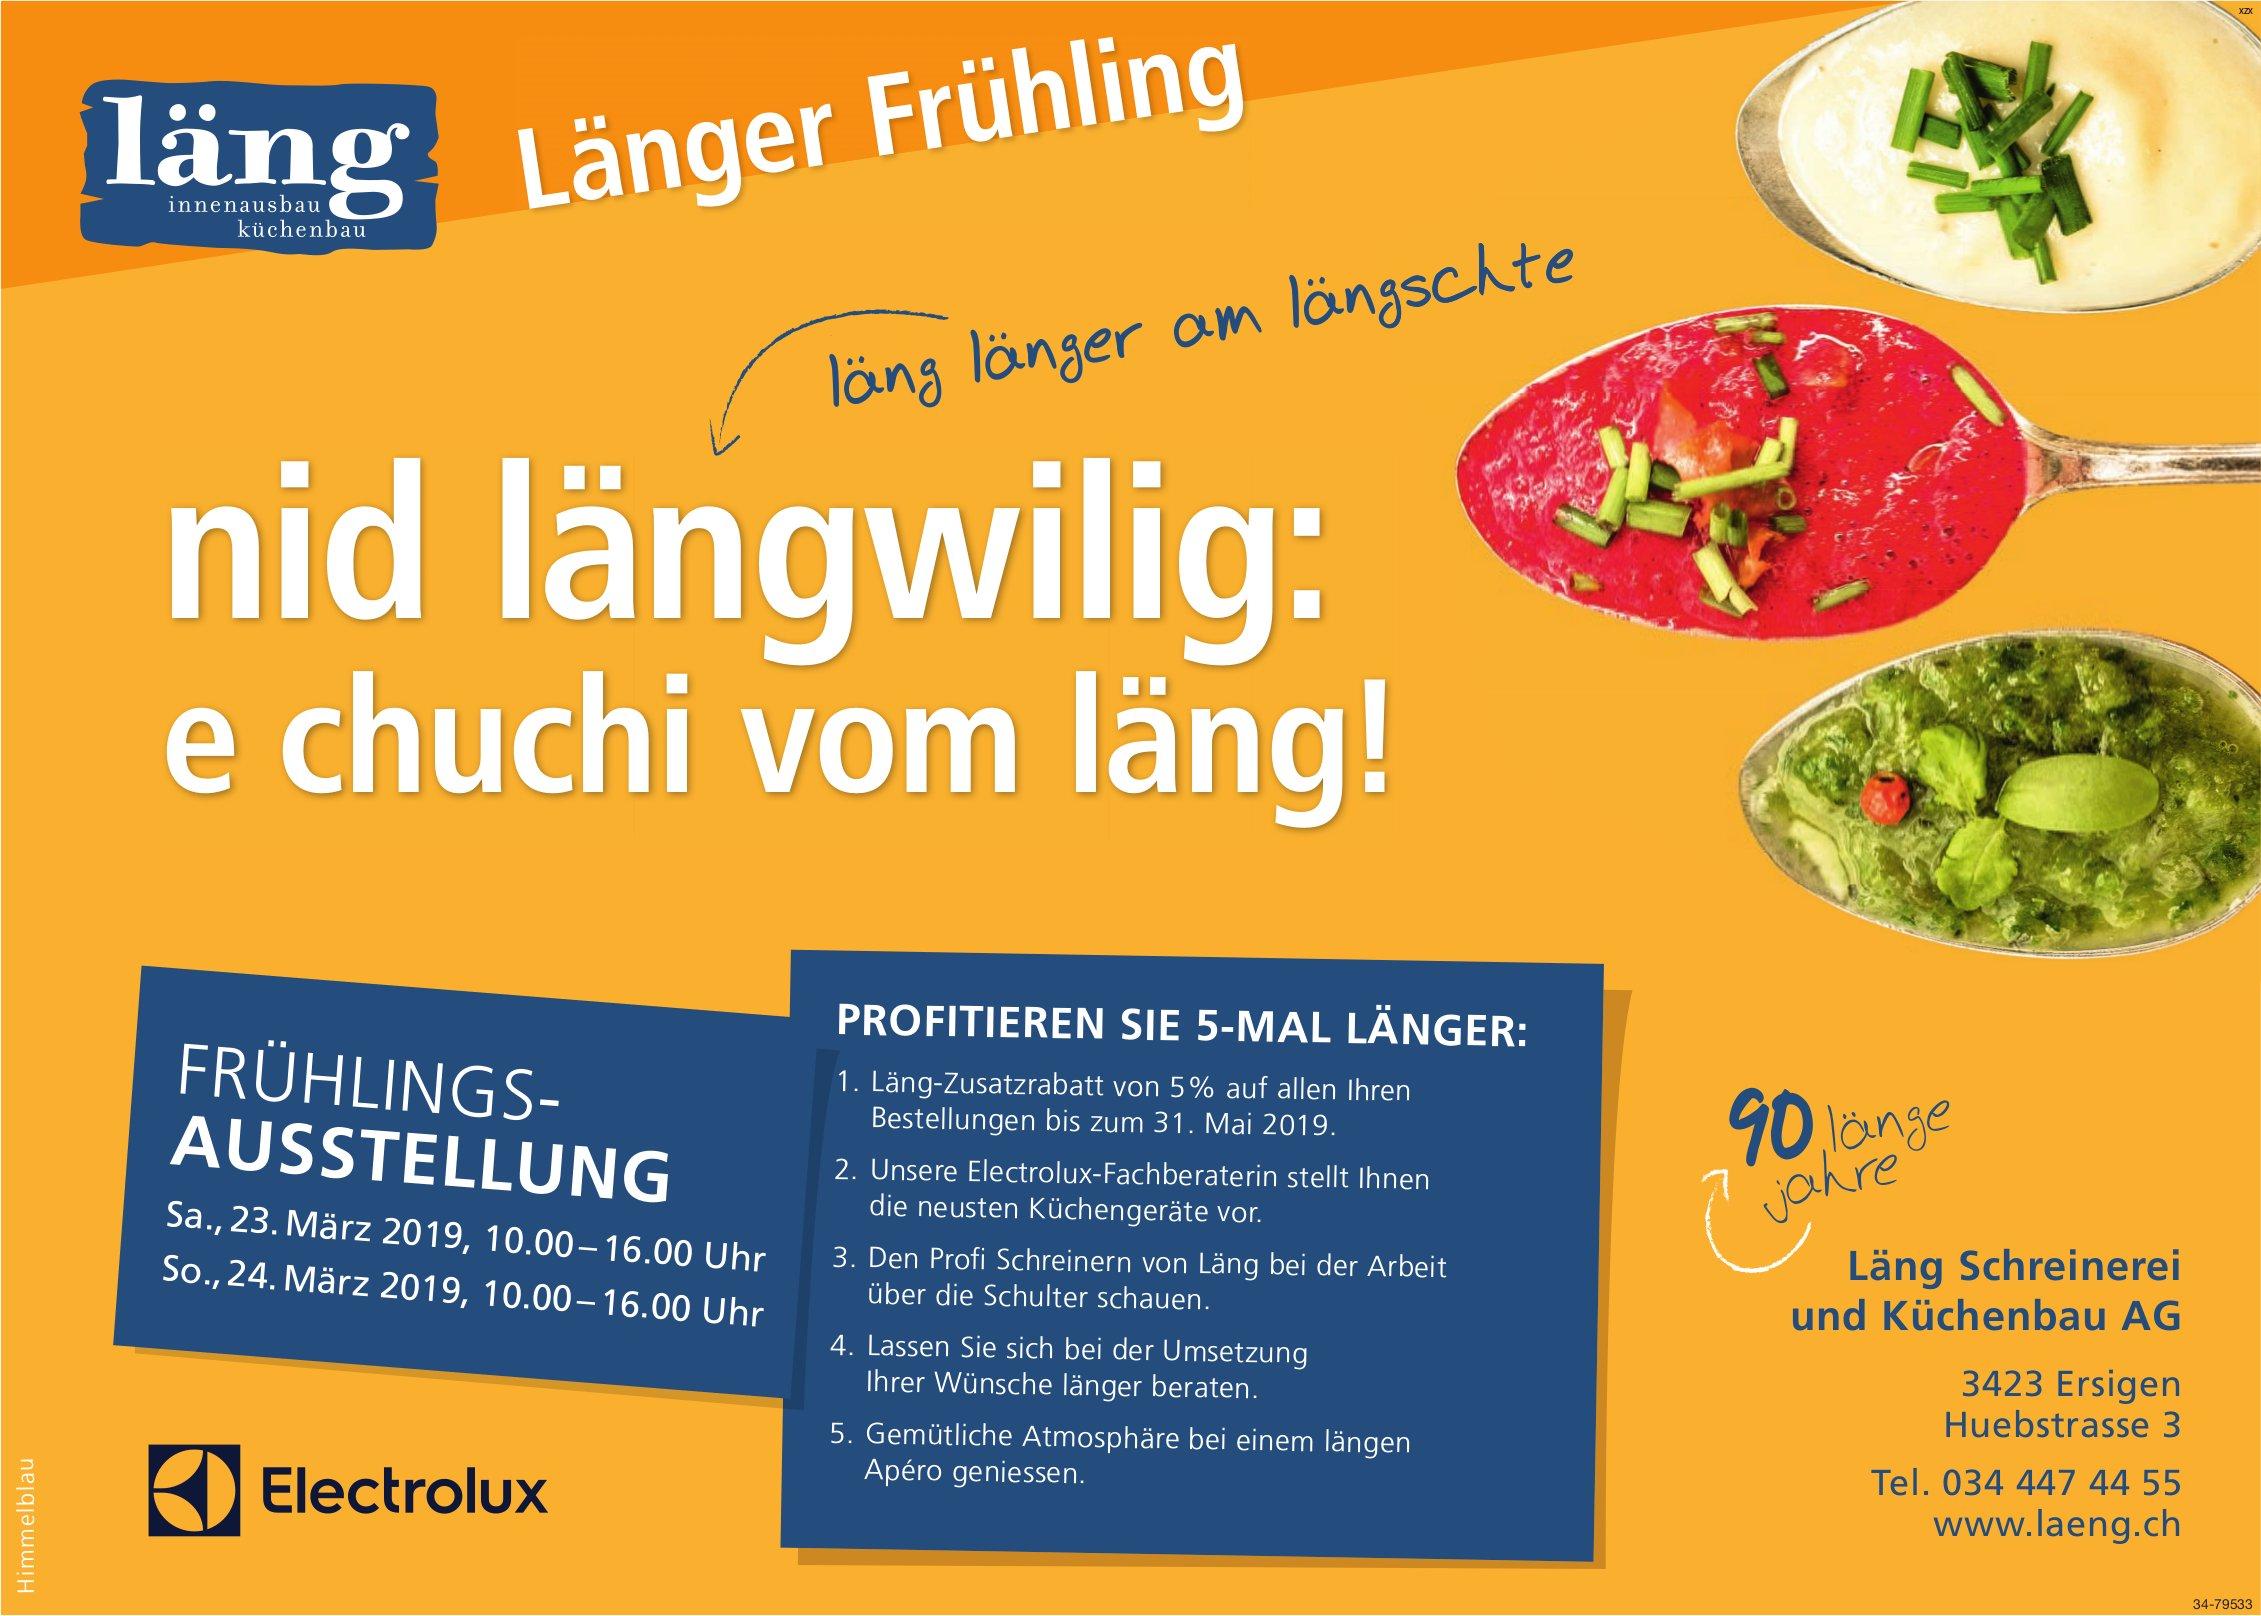 Länger Innenausbau/Küchenbau - Frühlingsausstellung, 23. + 24. März